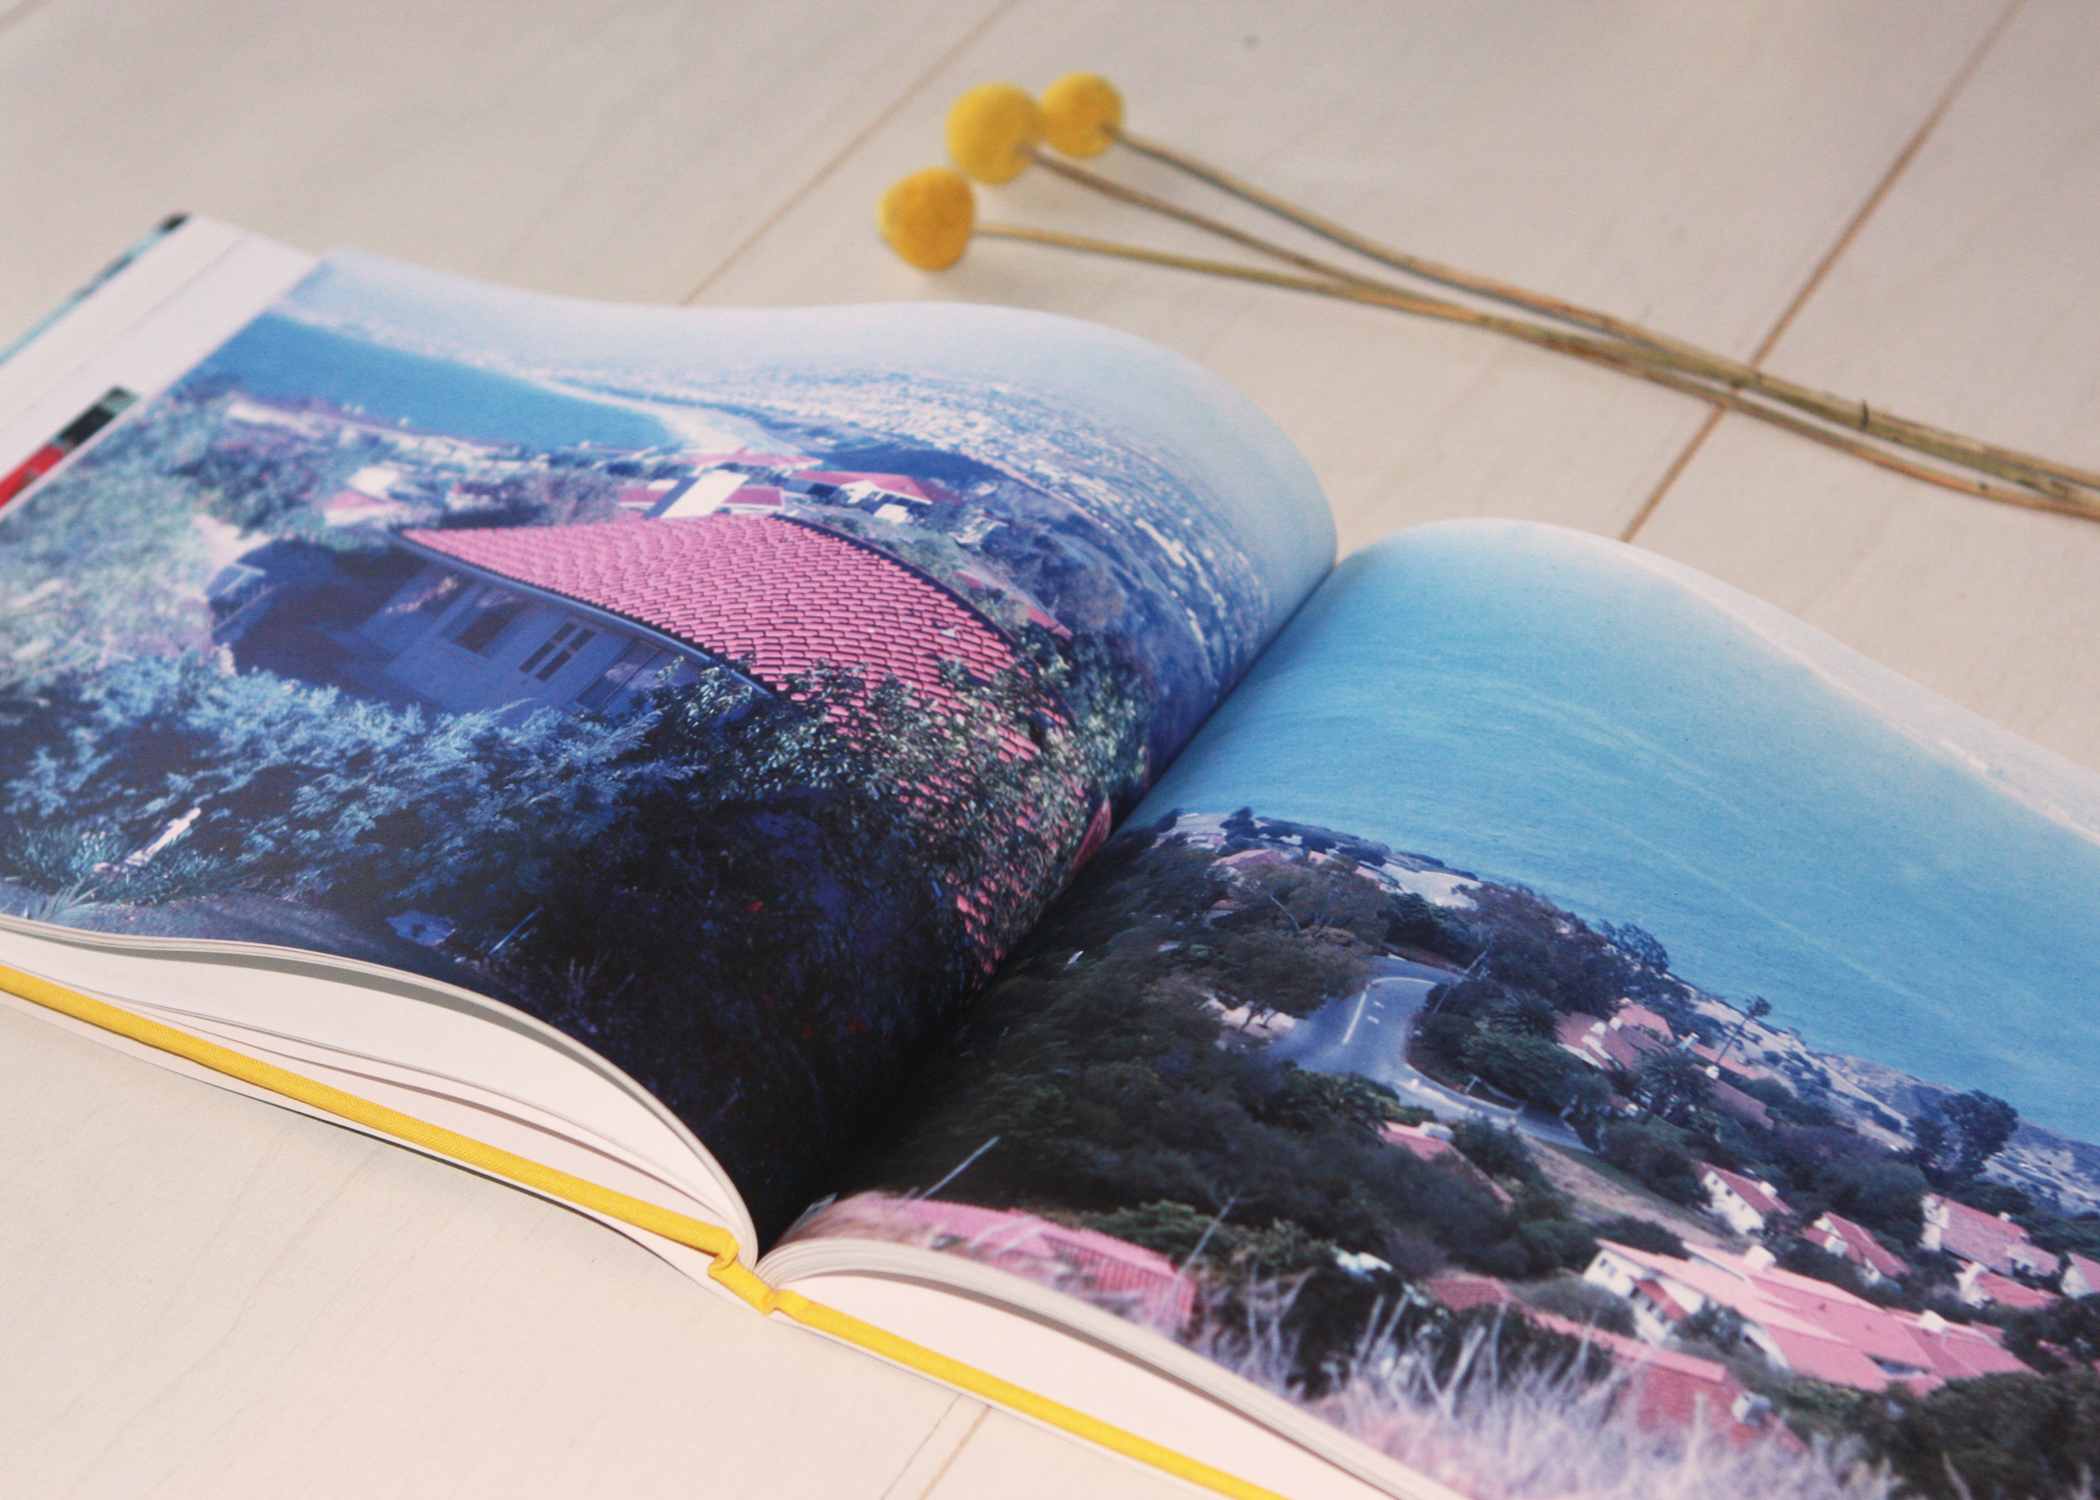 joanphotobook7